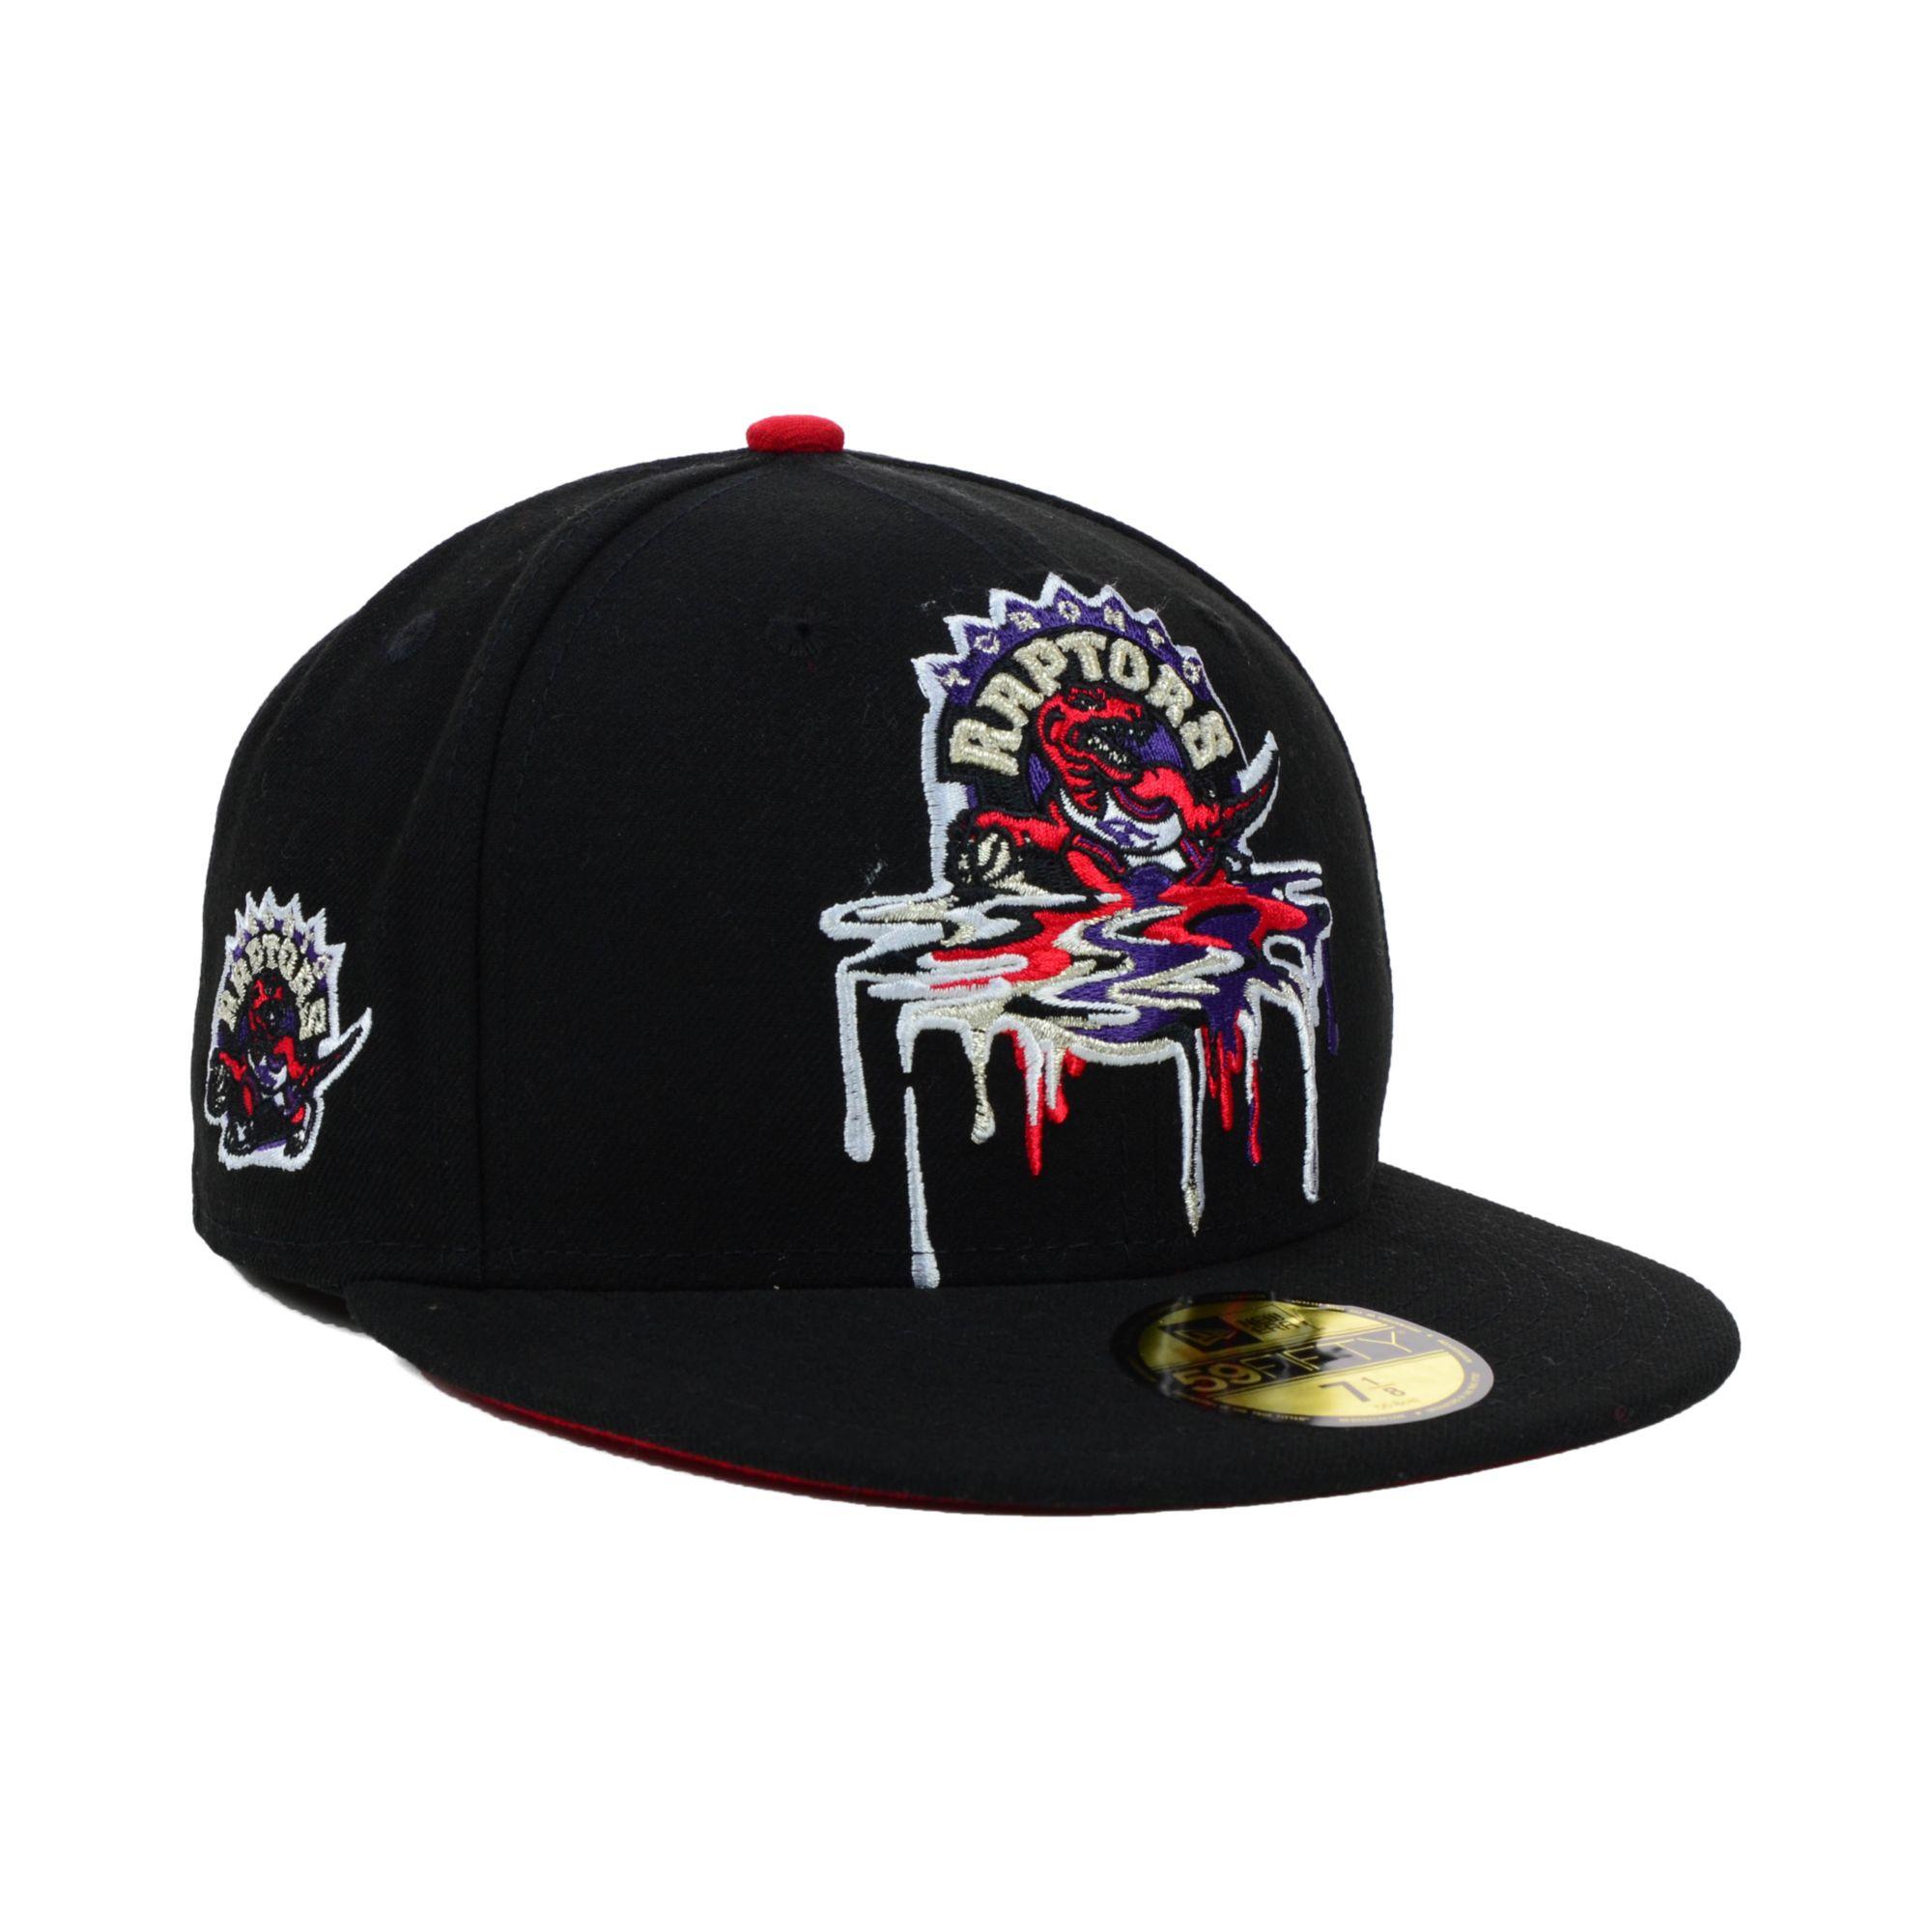 outlet store 36070 035b2 KTZ Toronto Raptors Nba Hardwood Classics Spring Melt 59fifty Cap in ...